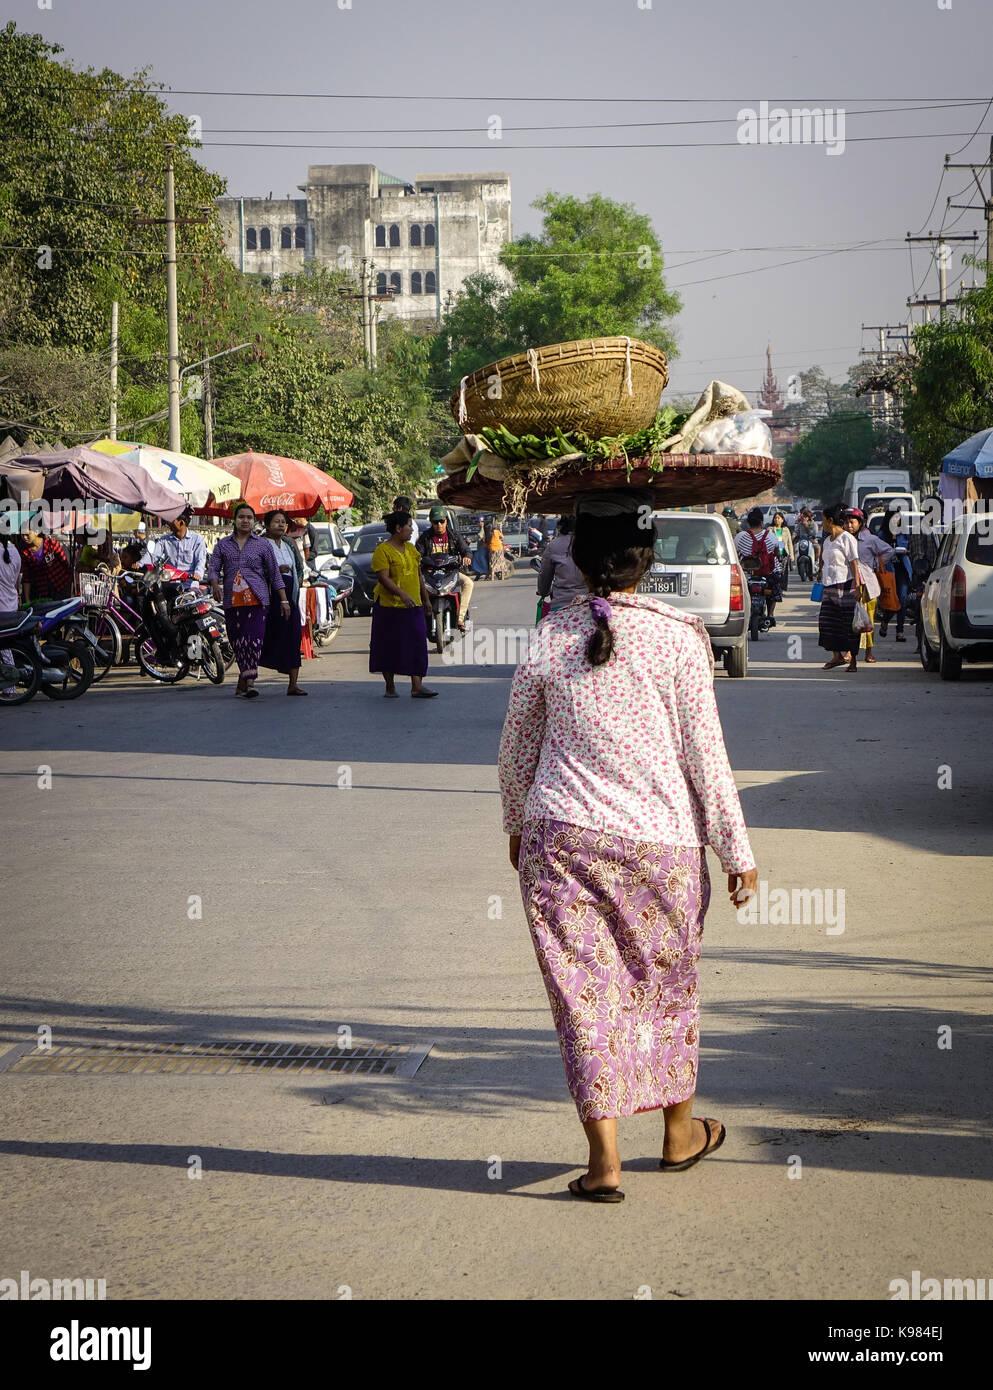 Yangon, Myanmar - Feb 11, 2017. A woman walking on sreet at sunny day in Yangon, Myanmar. Yangon boasts the largest - Stock Image